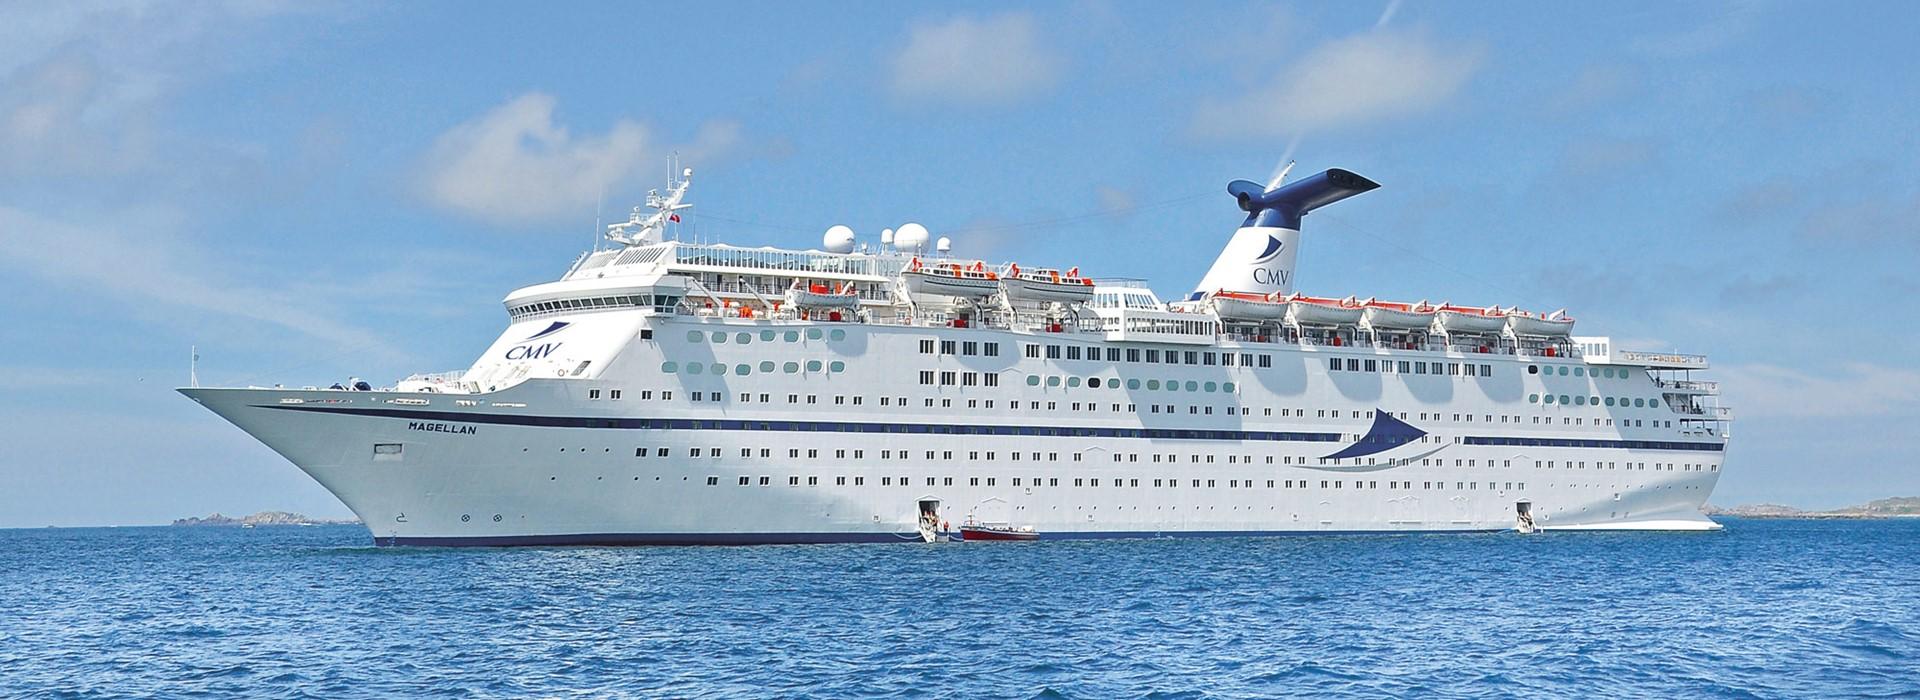 Top Cruises 2020.Top 10 Punto Medio Noticias Iglu Fly Cruises 2020